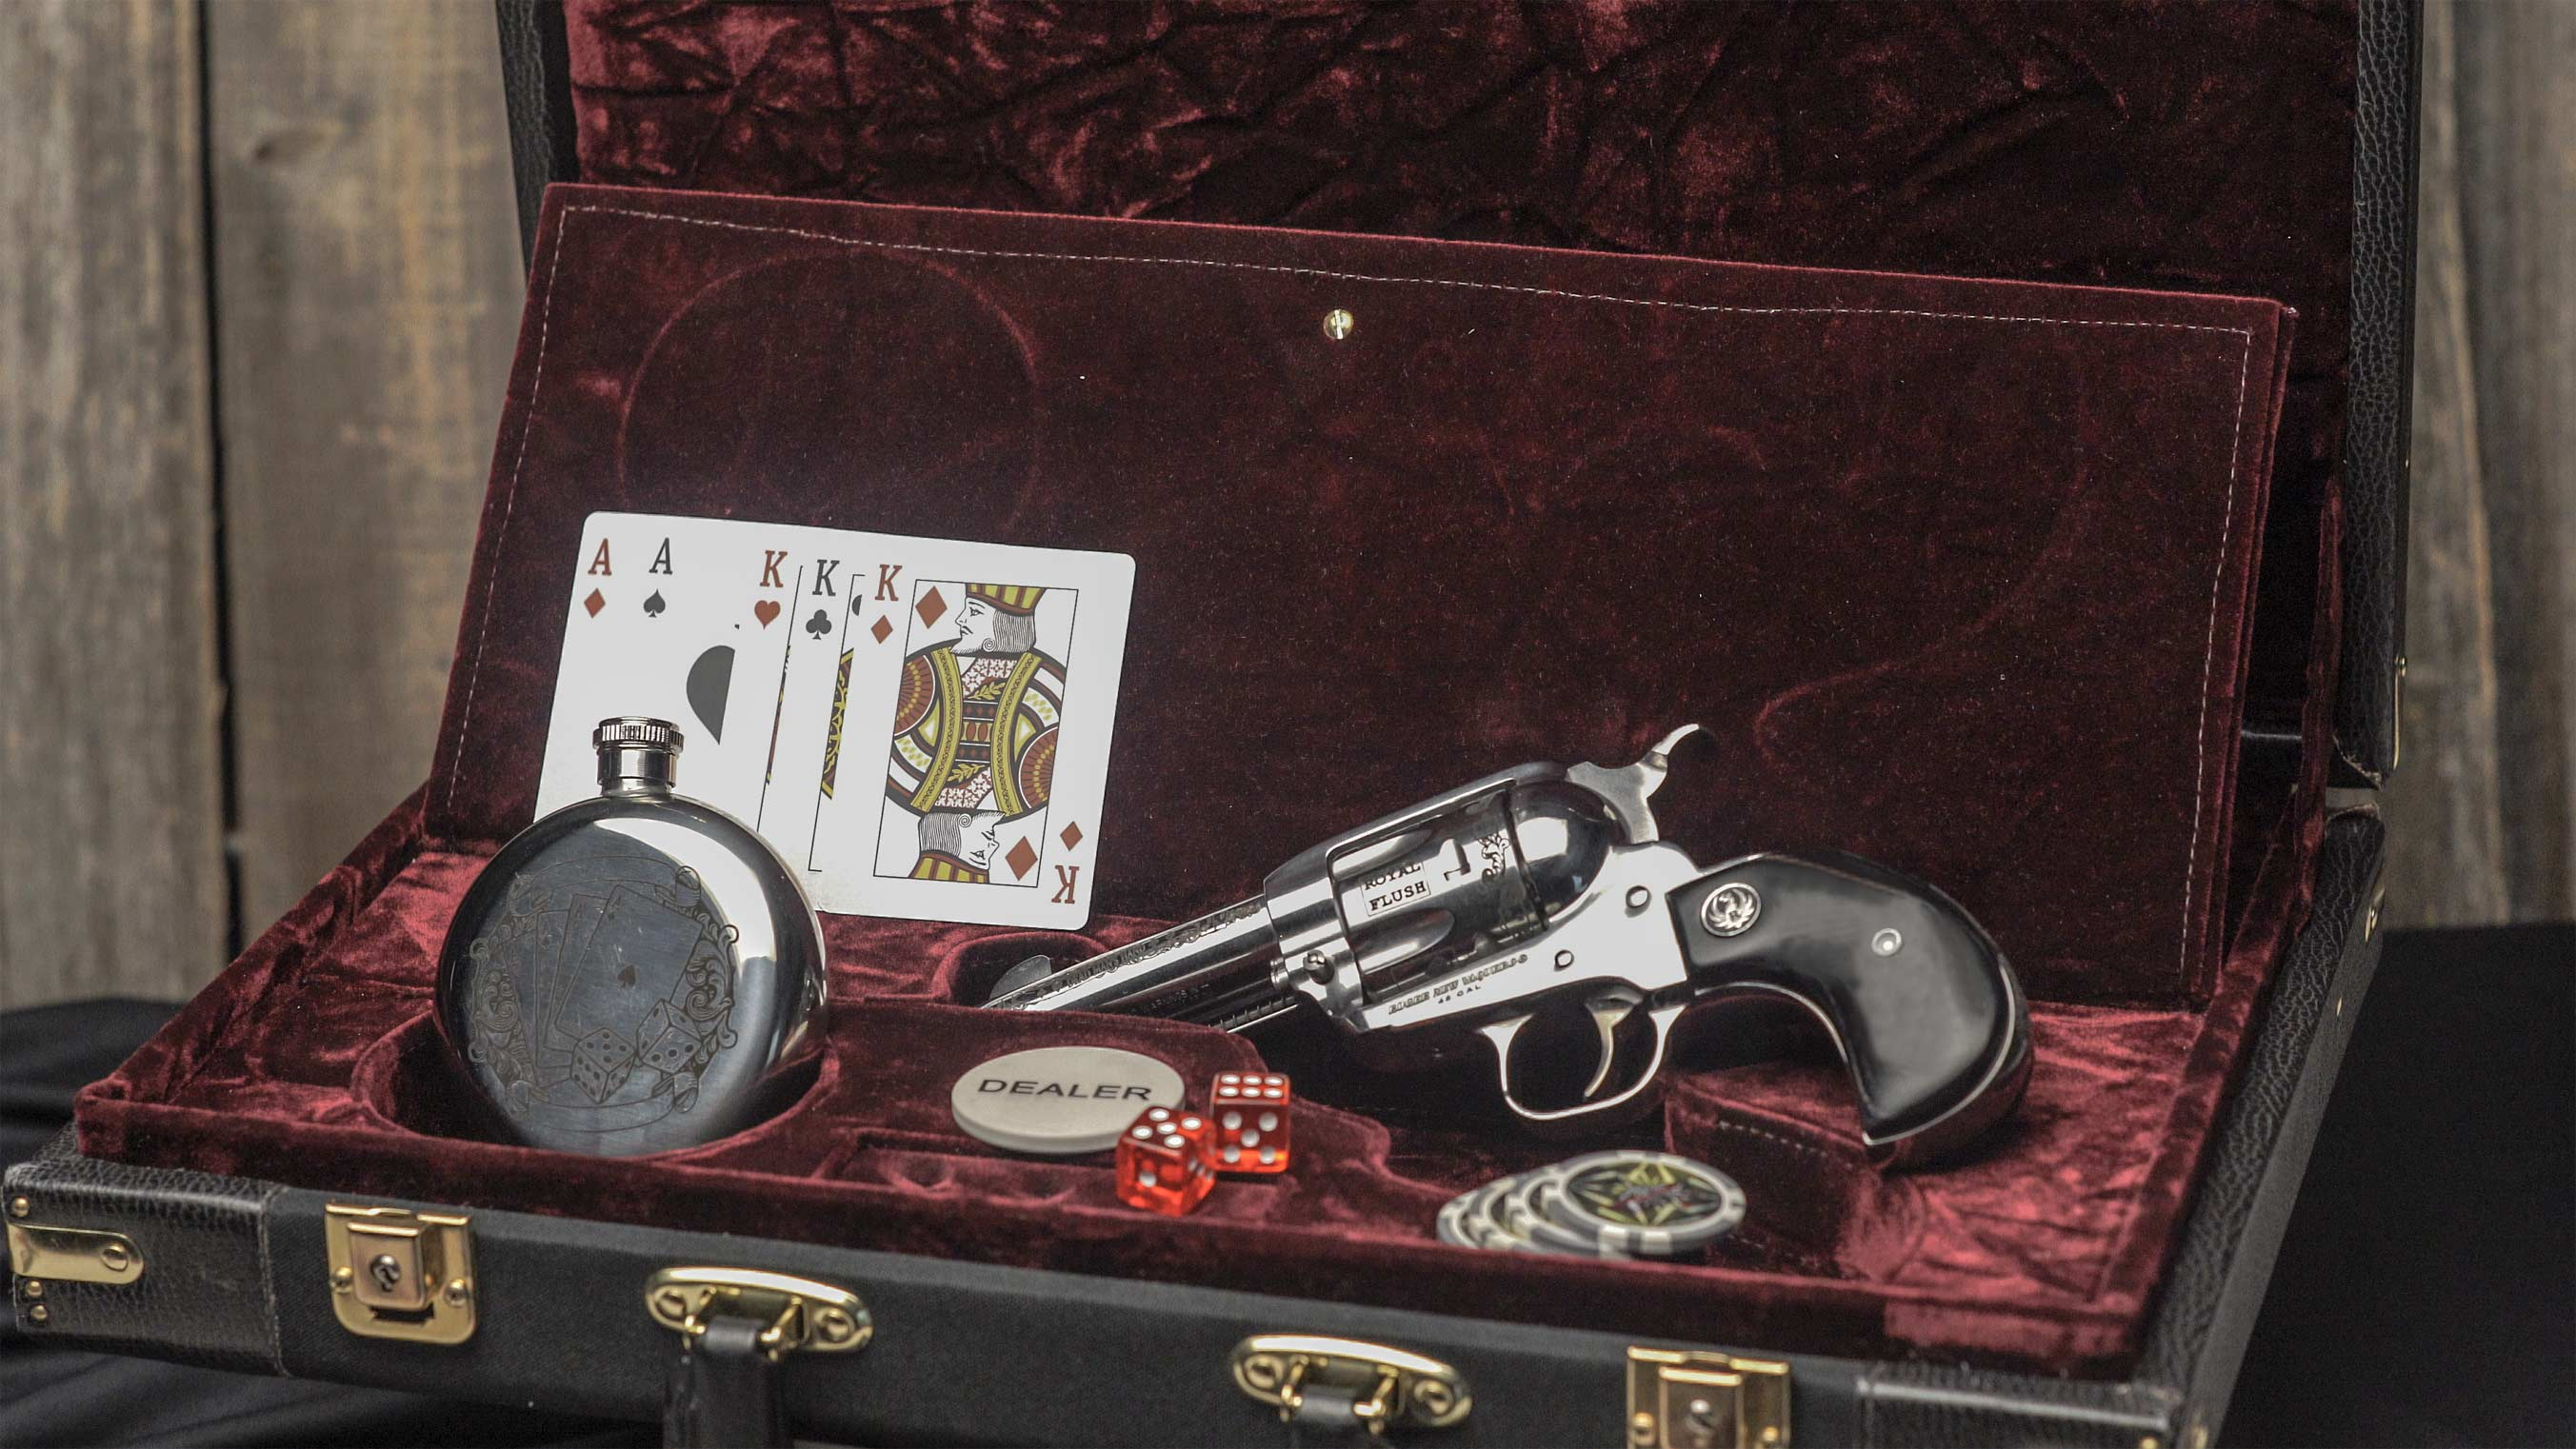 Gambler Revolver & Poker Set